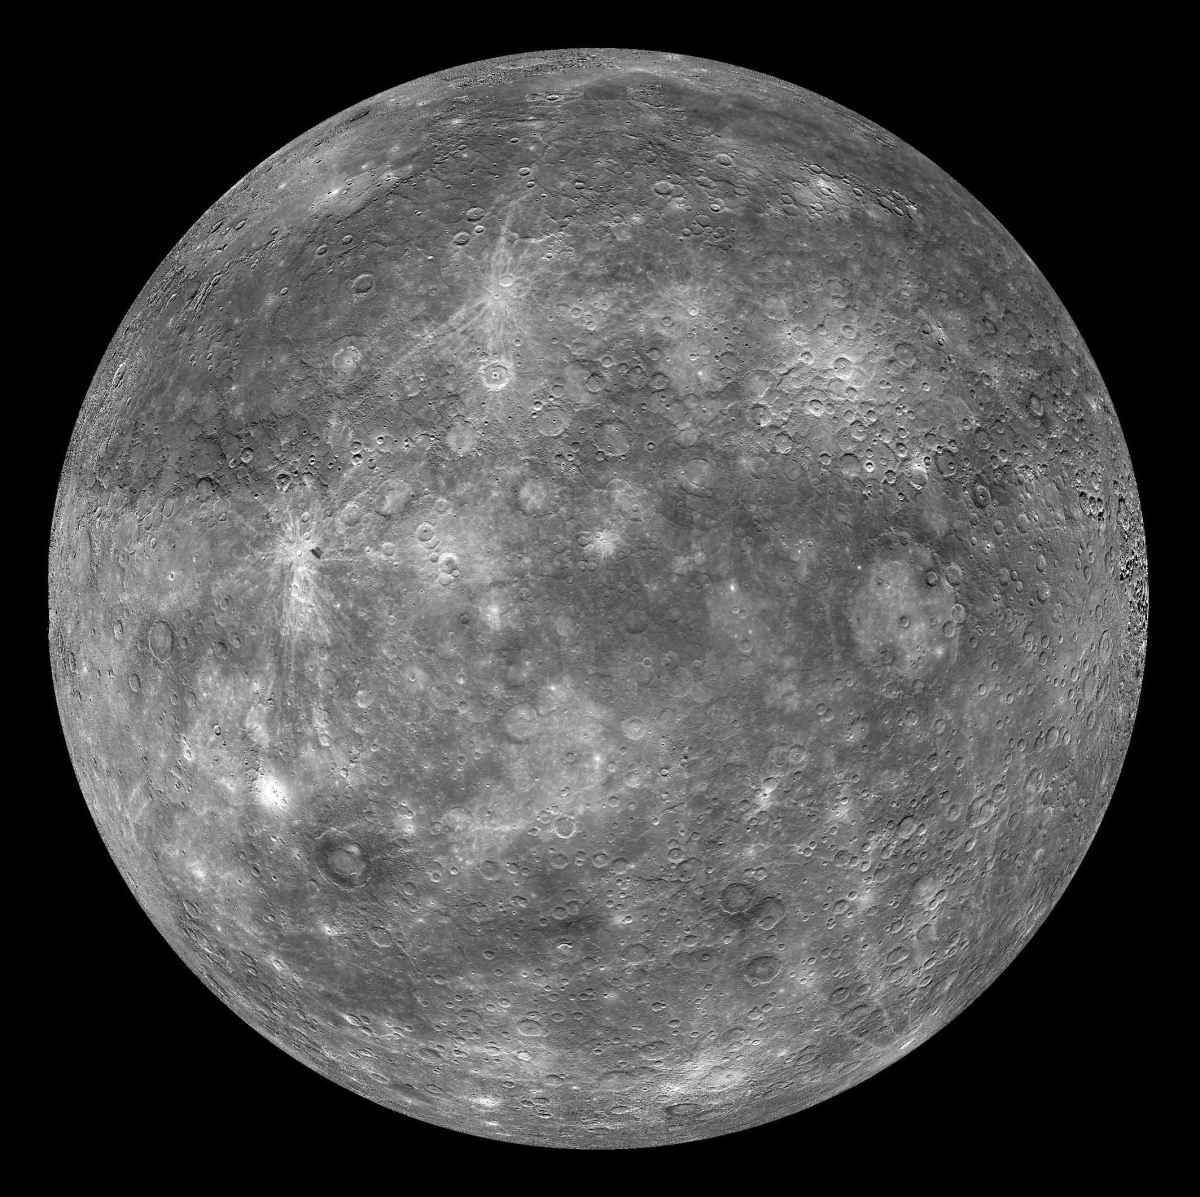 color planet mercury - HD1024×1022